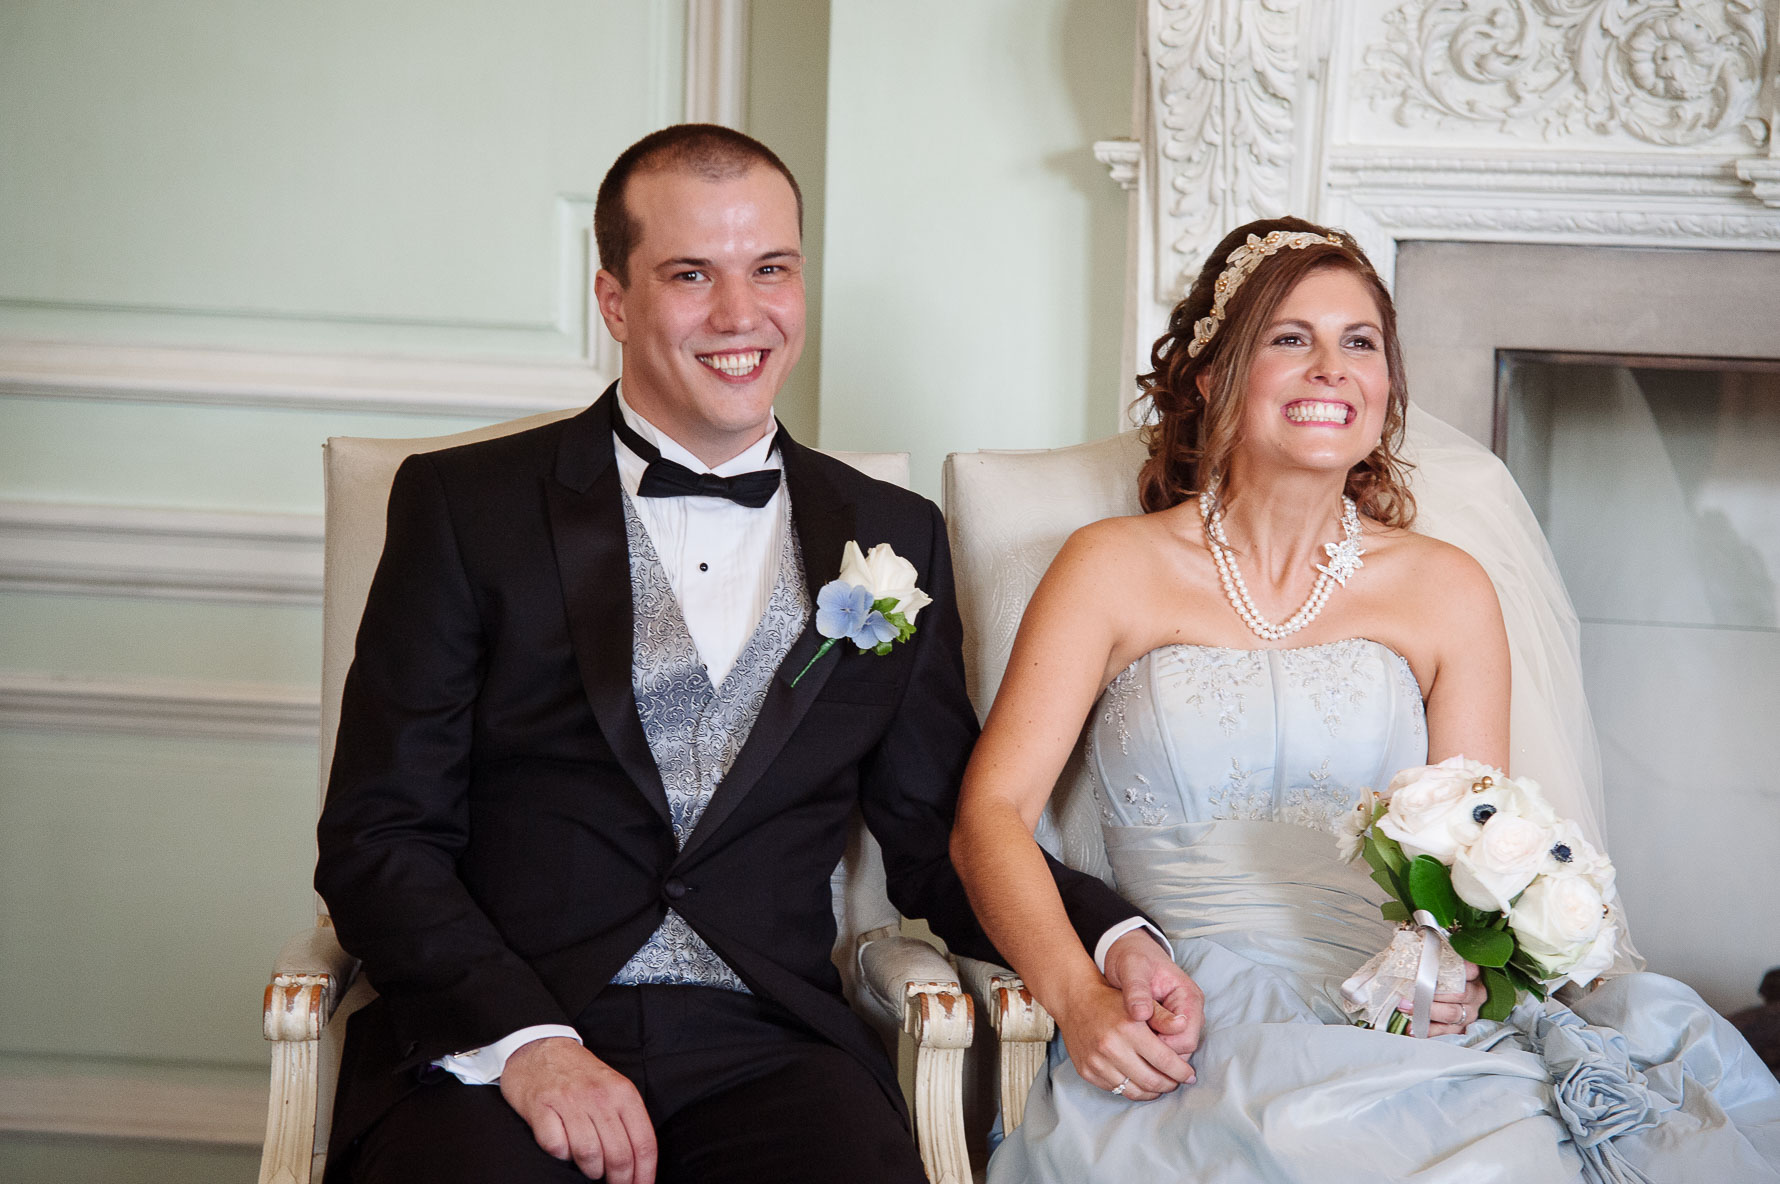 Leeds Castle Wedding22-20140919 0620